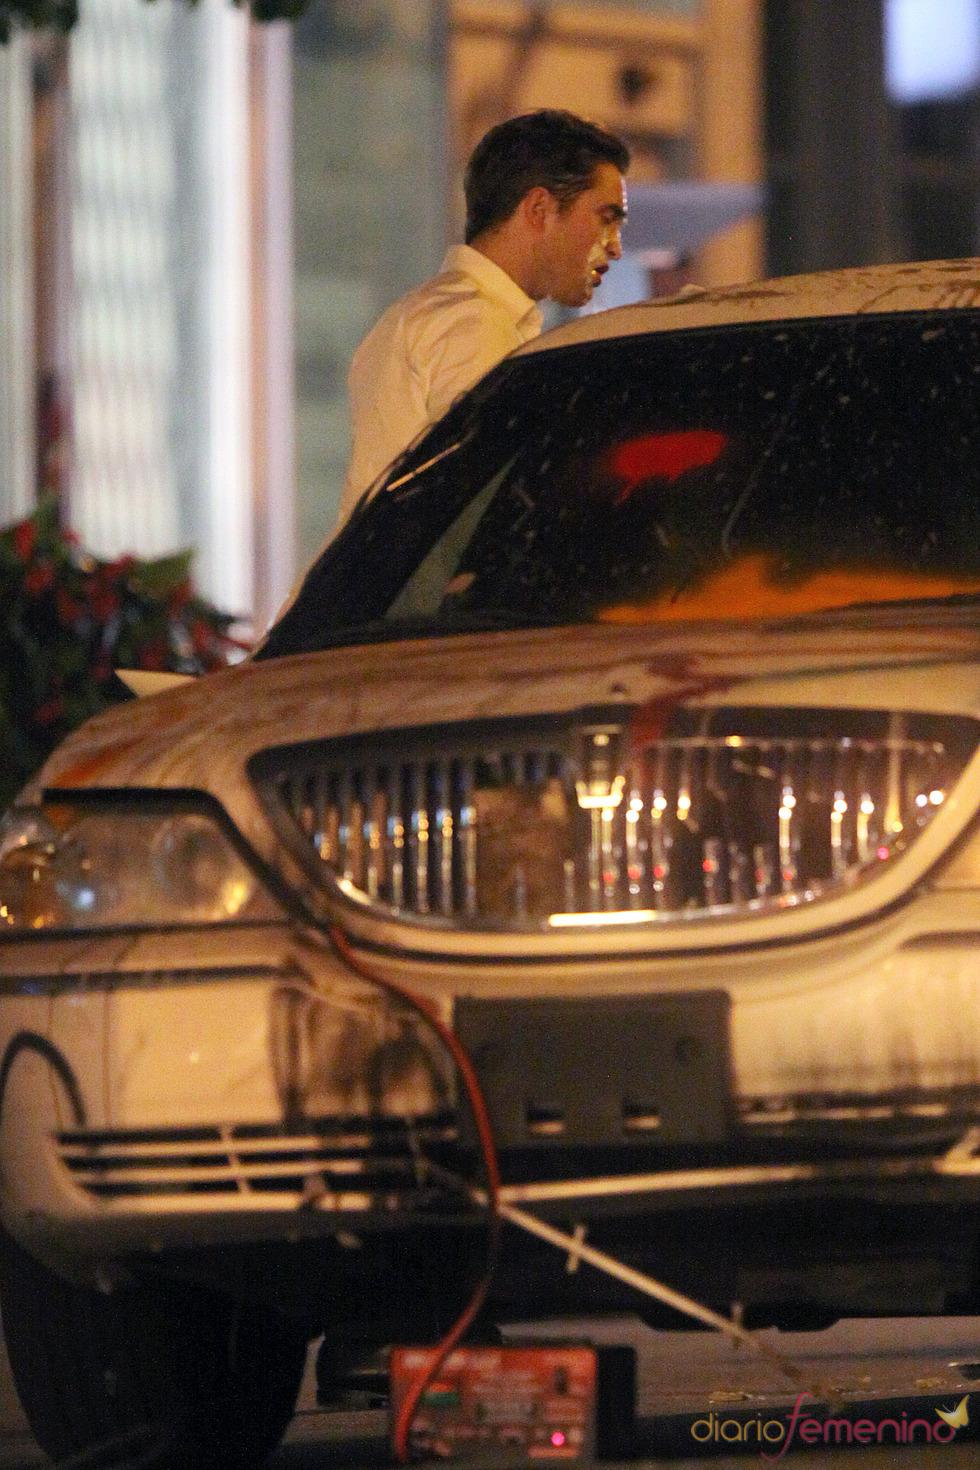 Robert Pattinson descubre horrorizado su coche lleno de pintadas